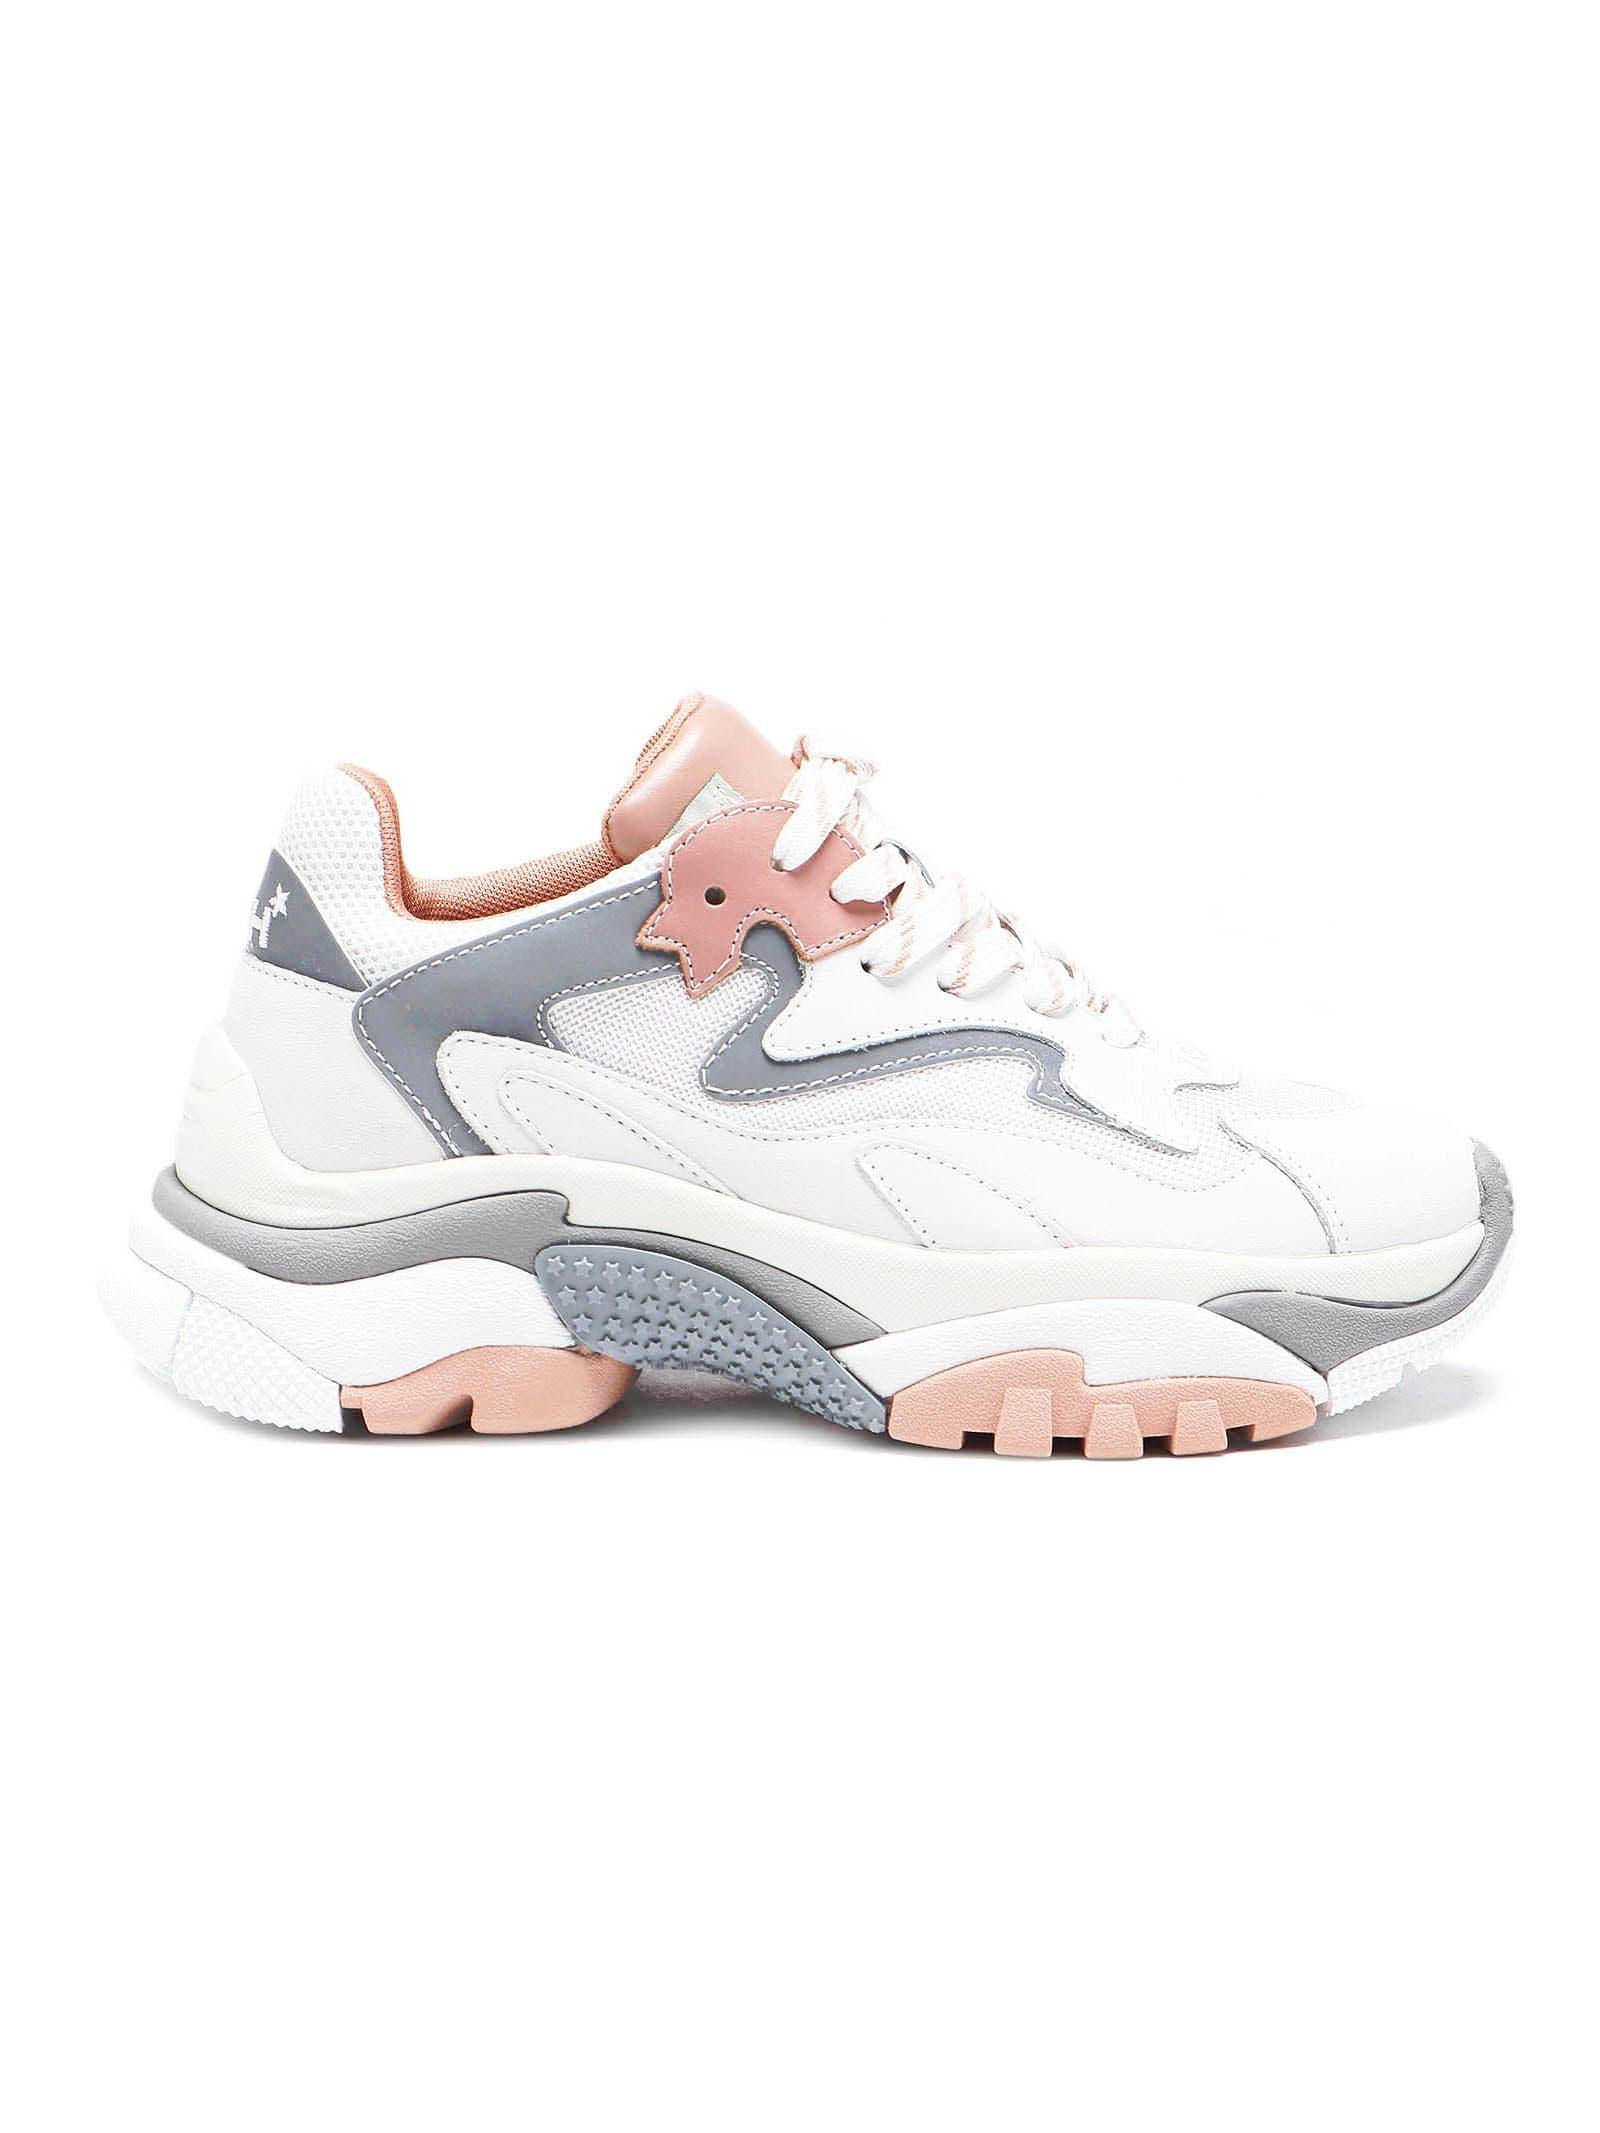 Ash Sneakers   italist, ALWAYS LIKE A SALE